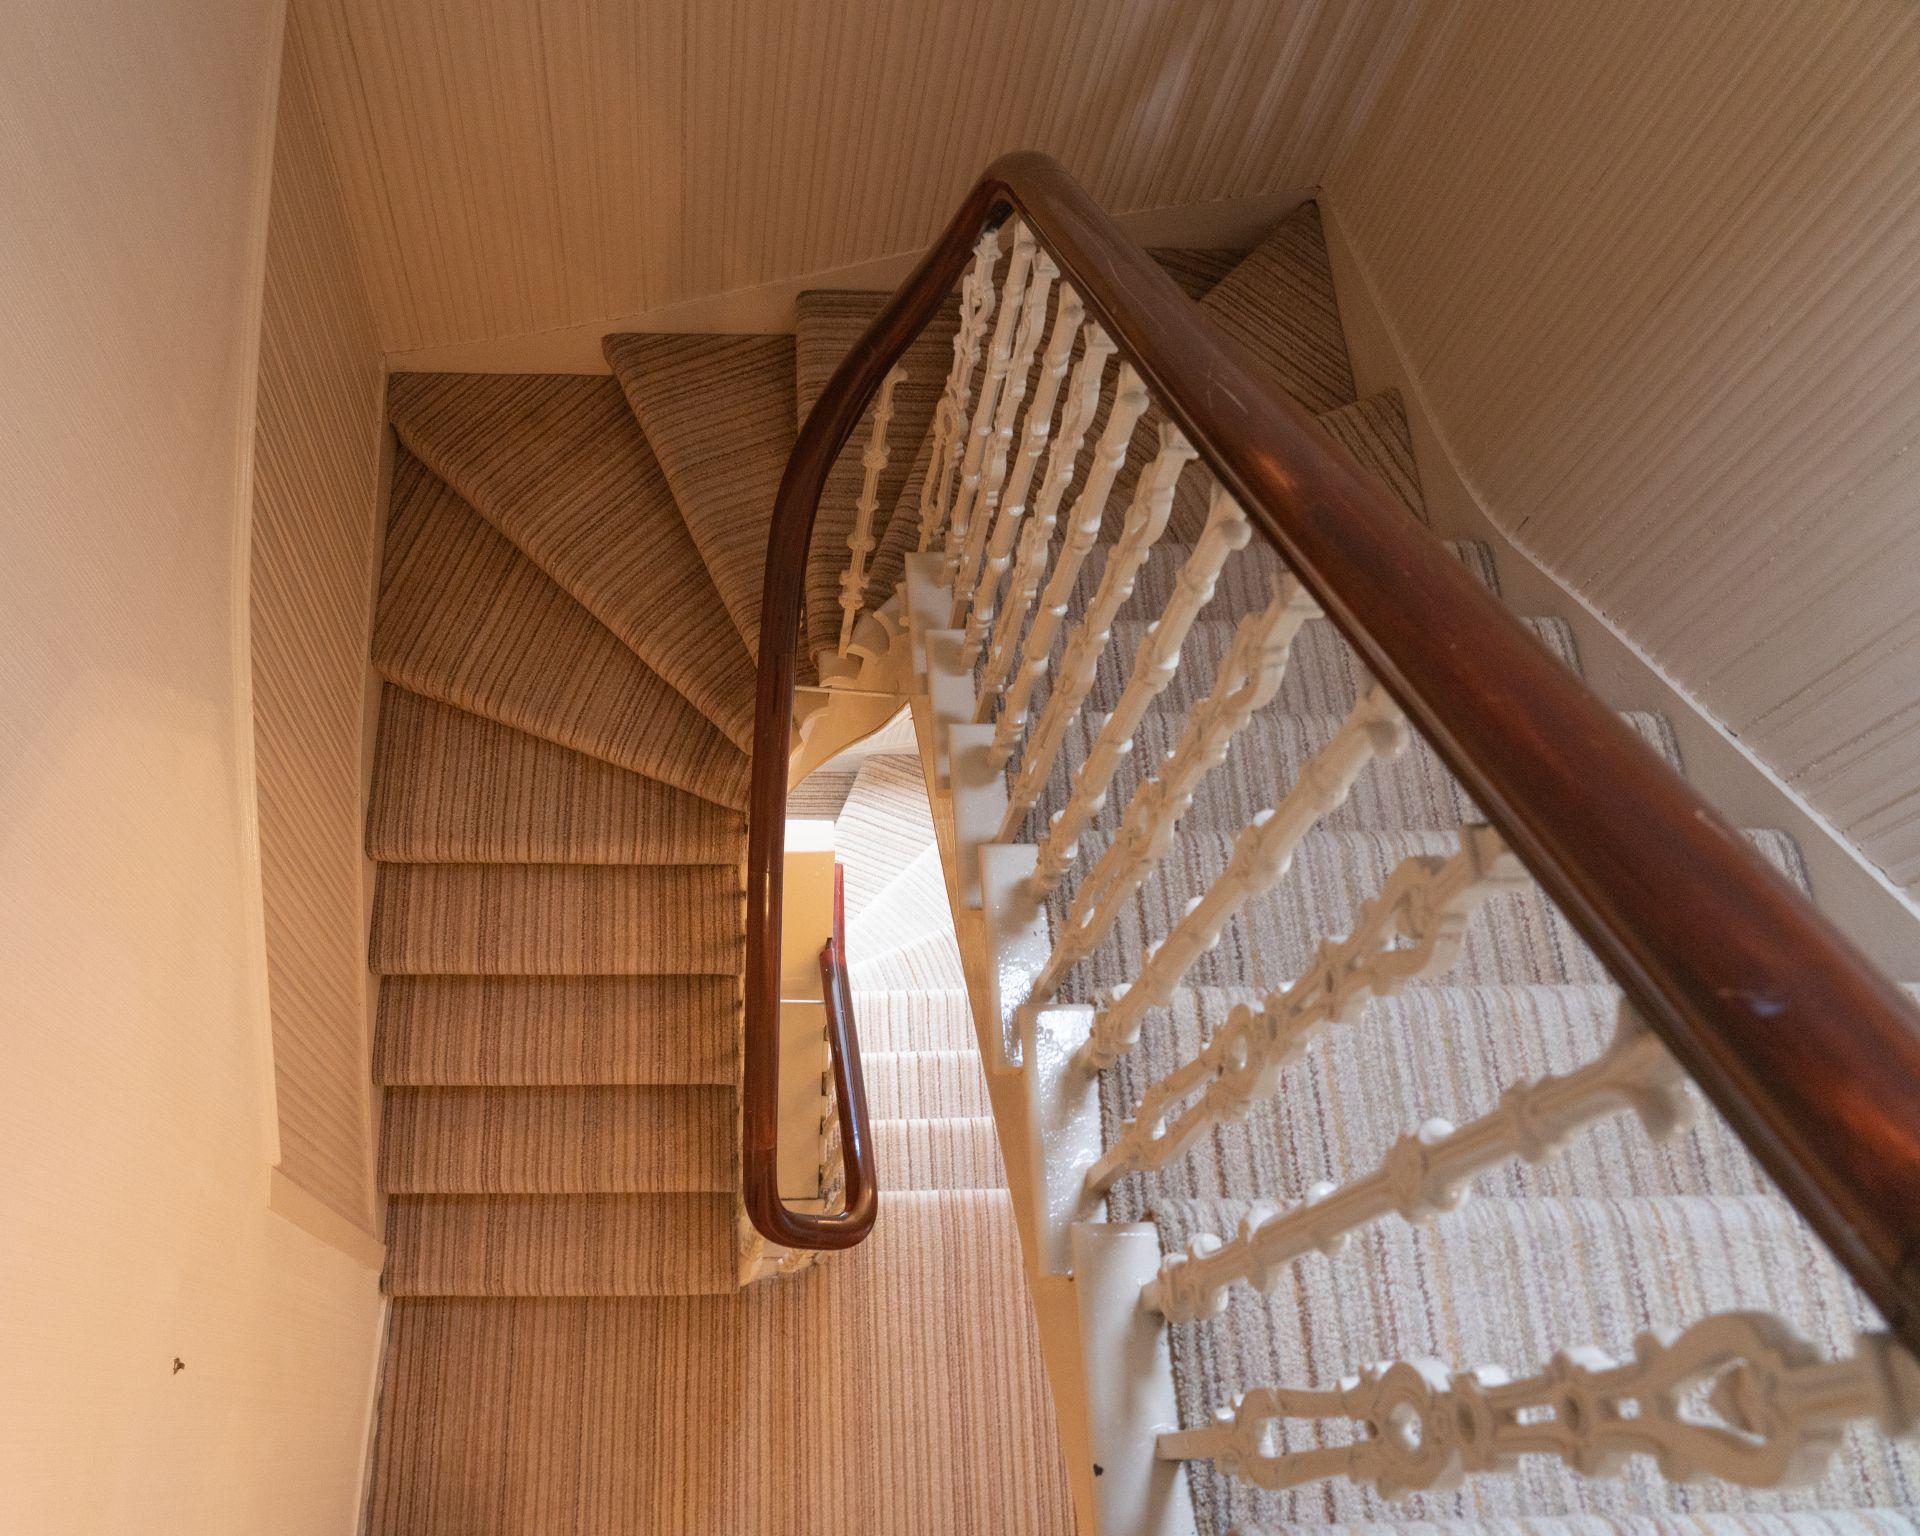 ARD-Properties-Development-Sites-Buy-Homes-Rent-Aberdeenshire-Rentals-2a-St-Andrew-Streeet-Peterhead-Banner (24)